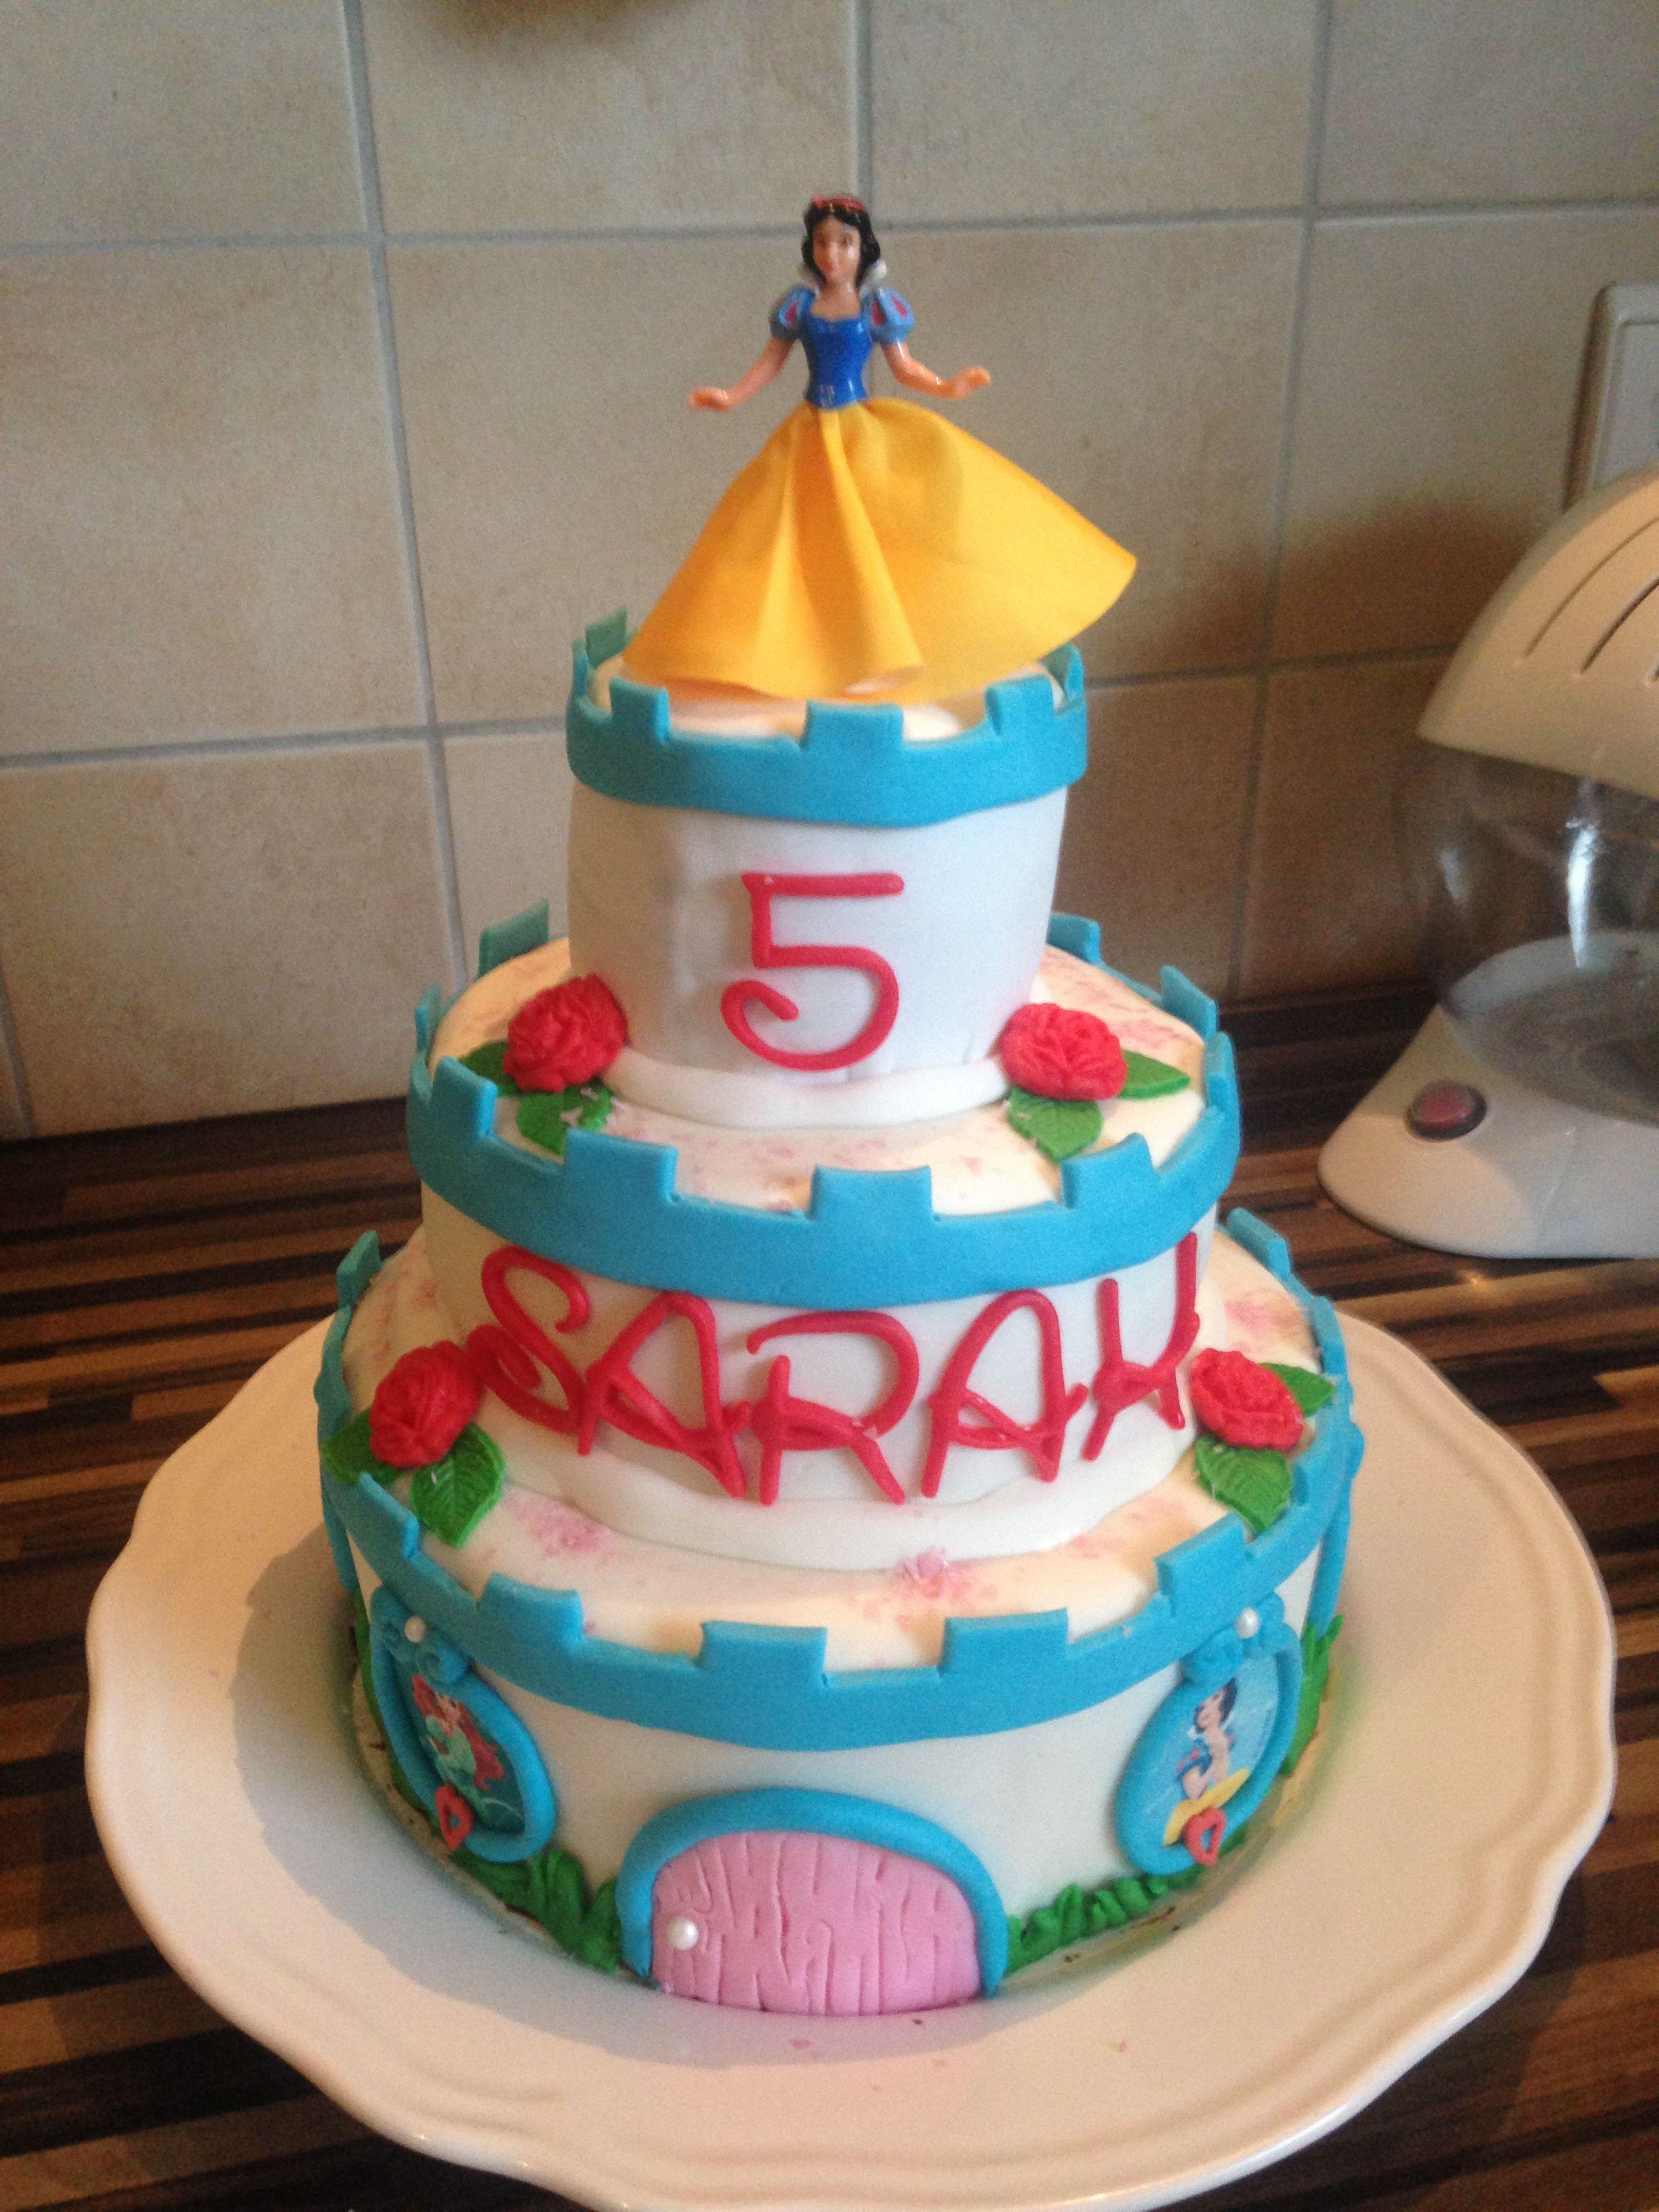 Schneewitchen- Schloss - Kuchen #disney #princess #kuchen #cake ...